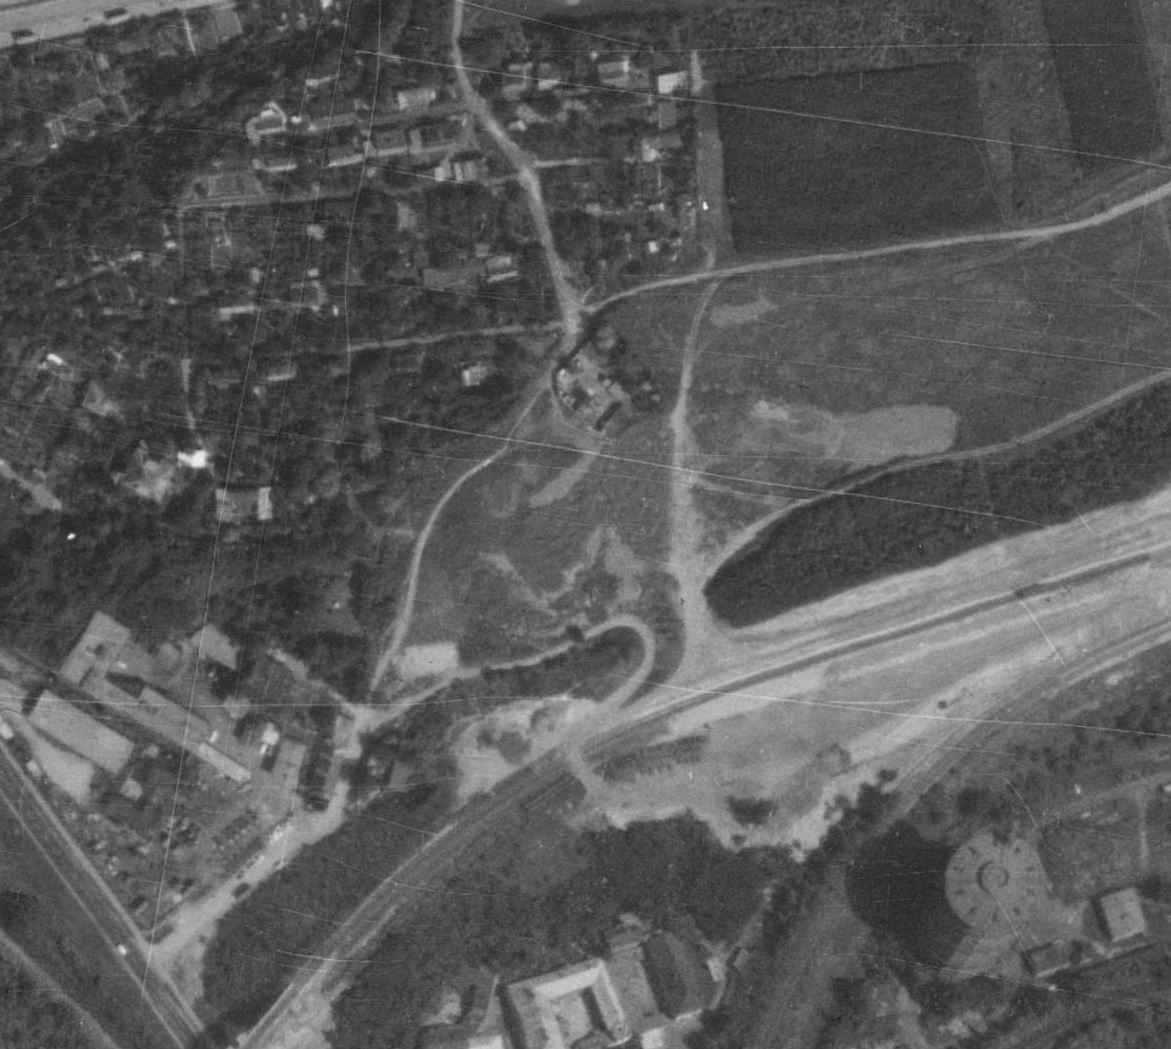 nouzova-kolonie-udoli-desu-letecky-snimek-1975